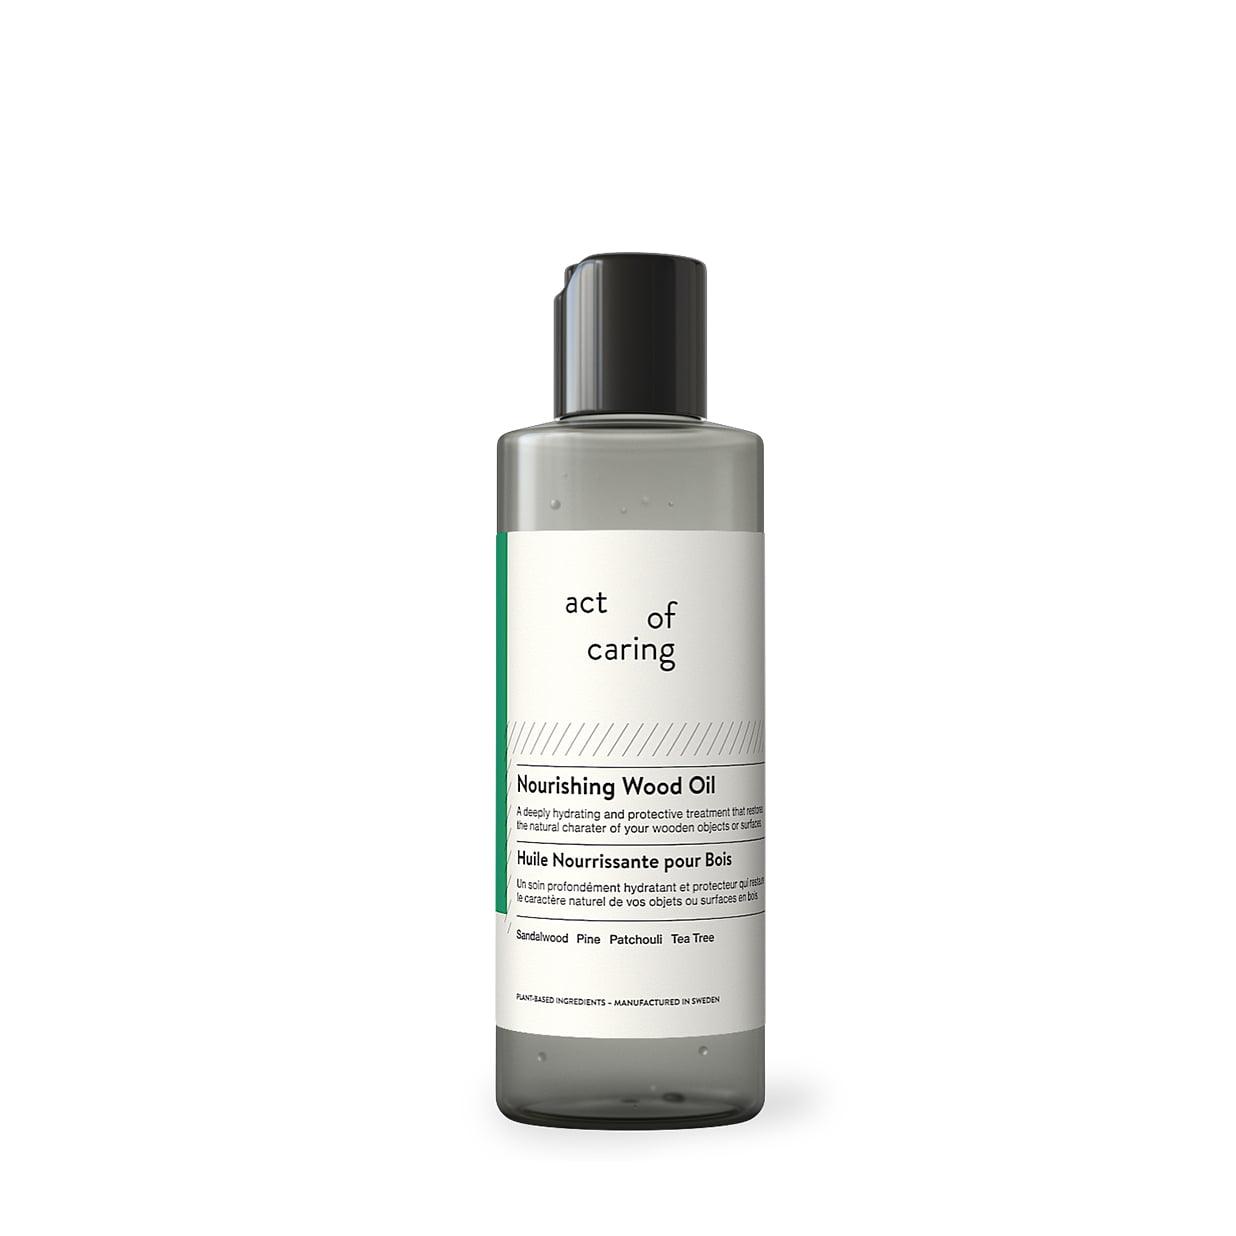 Dahlagenturer - Nourishing Wood Oil